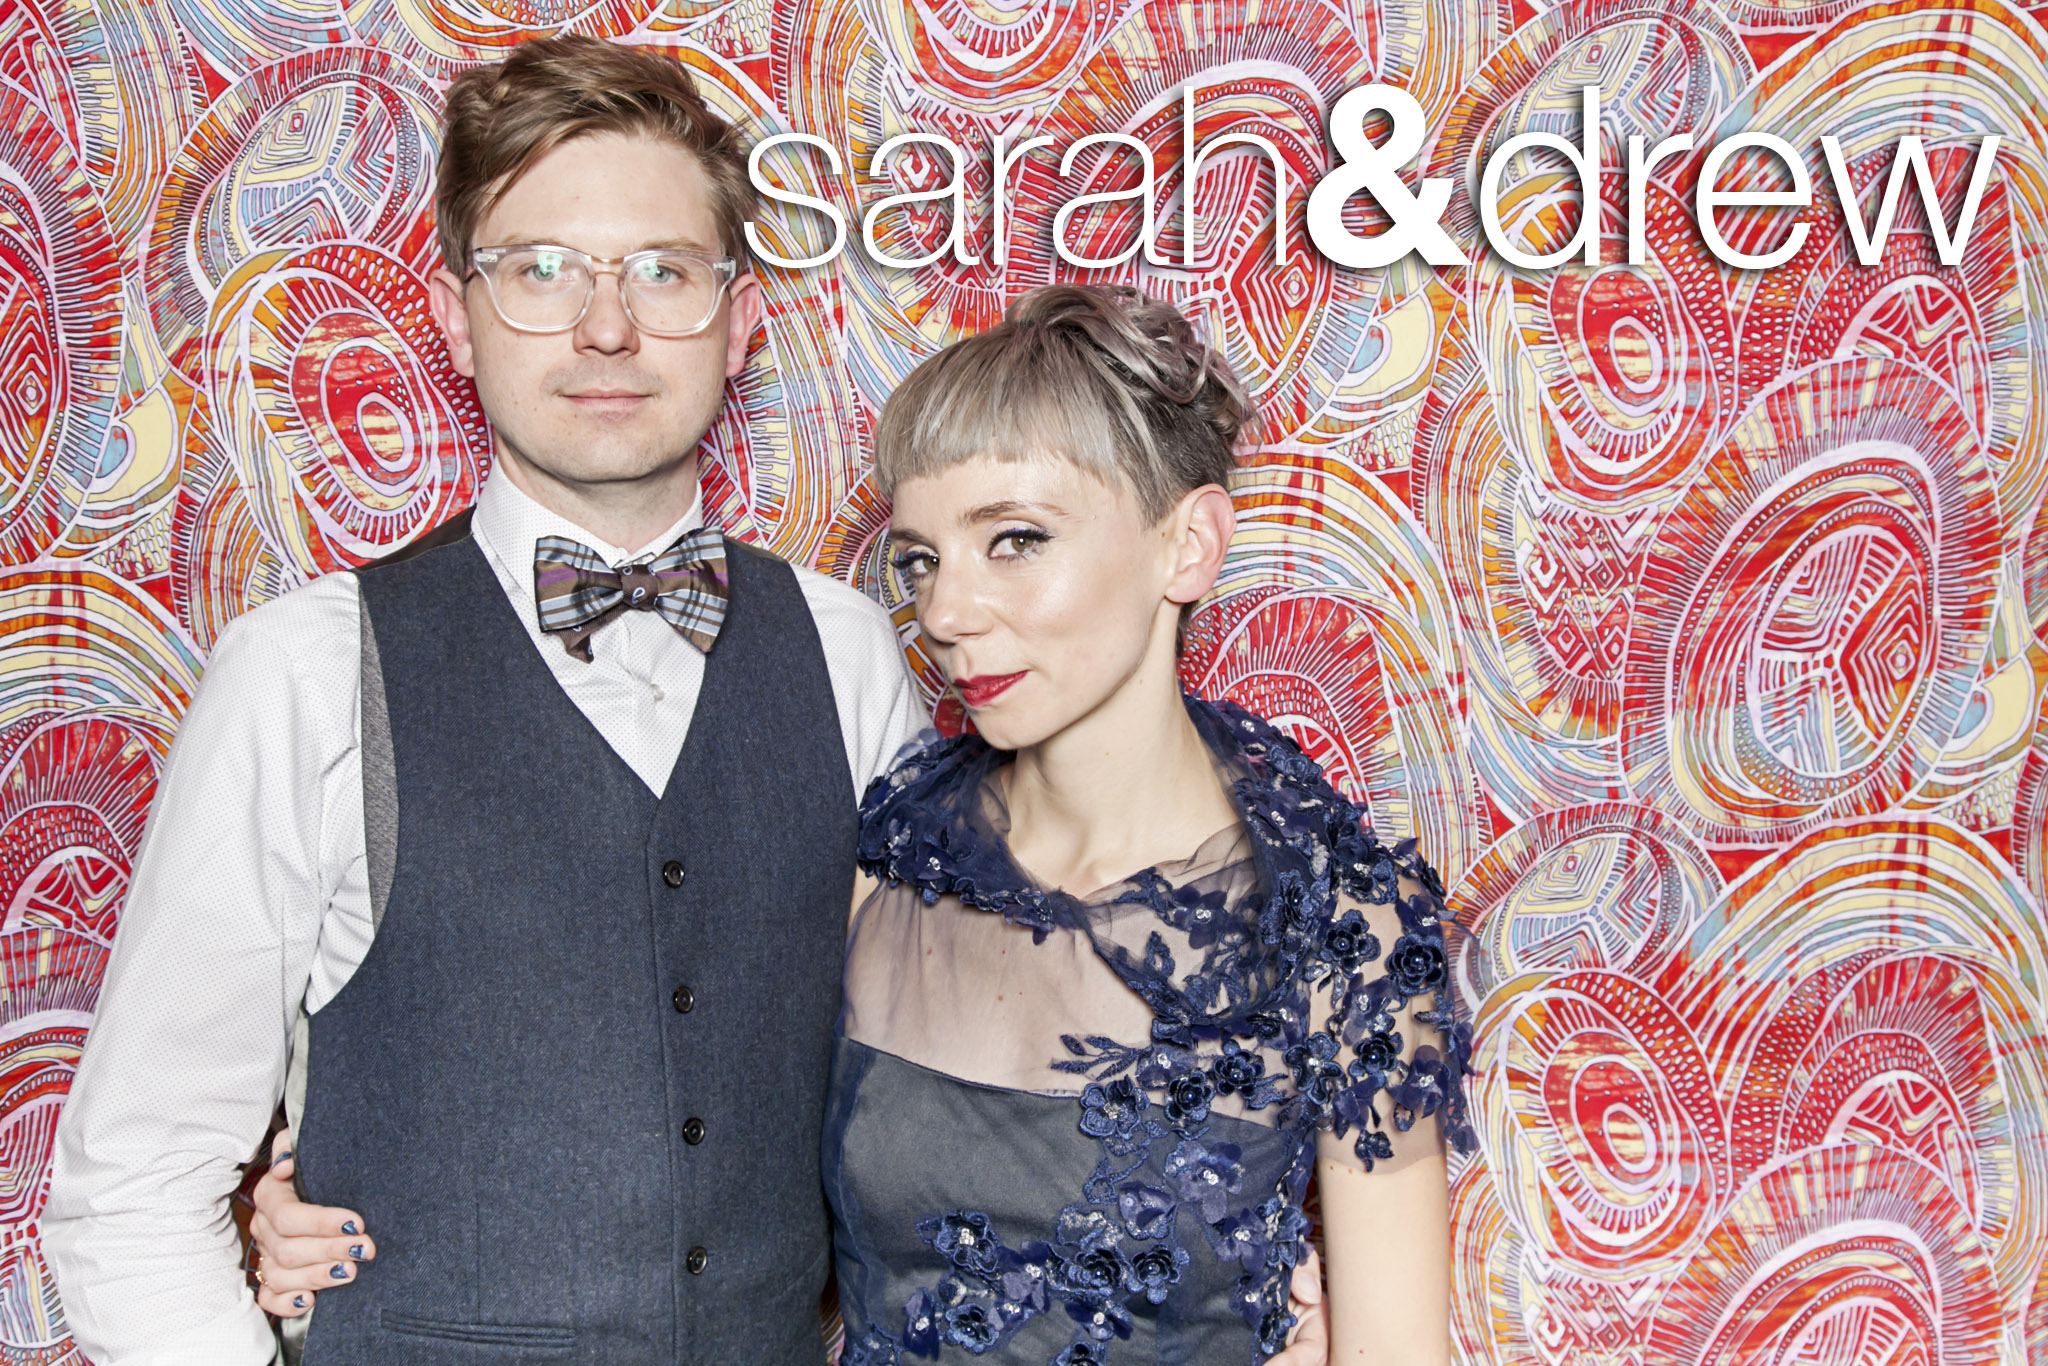 Sarah and Drew